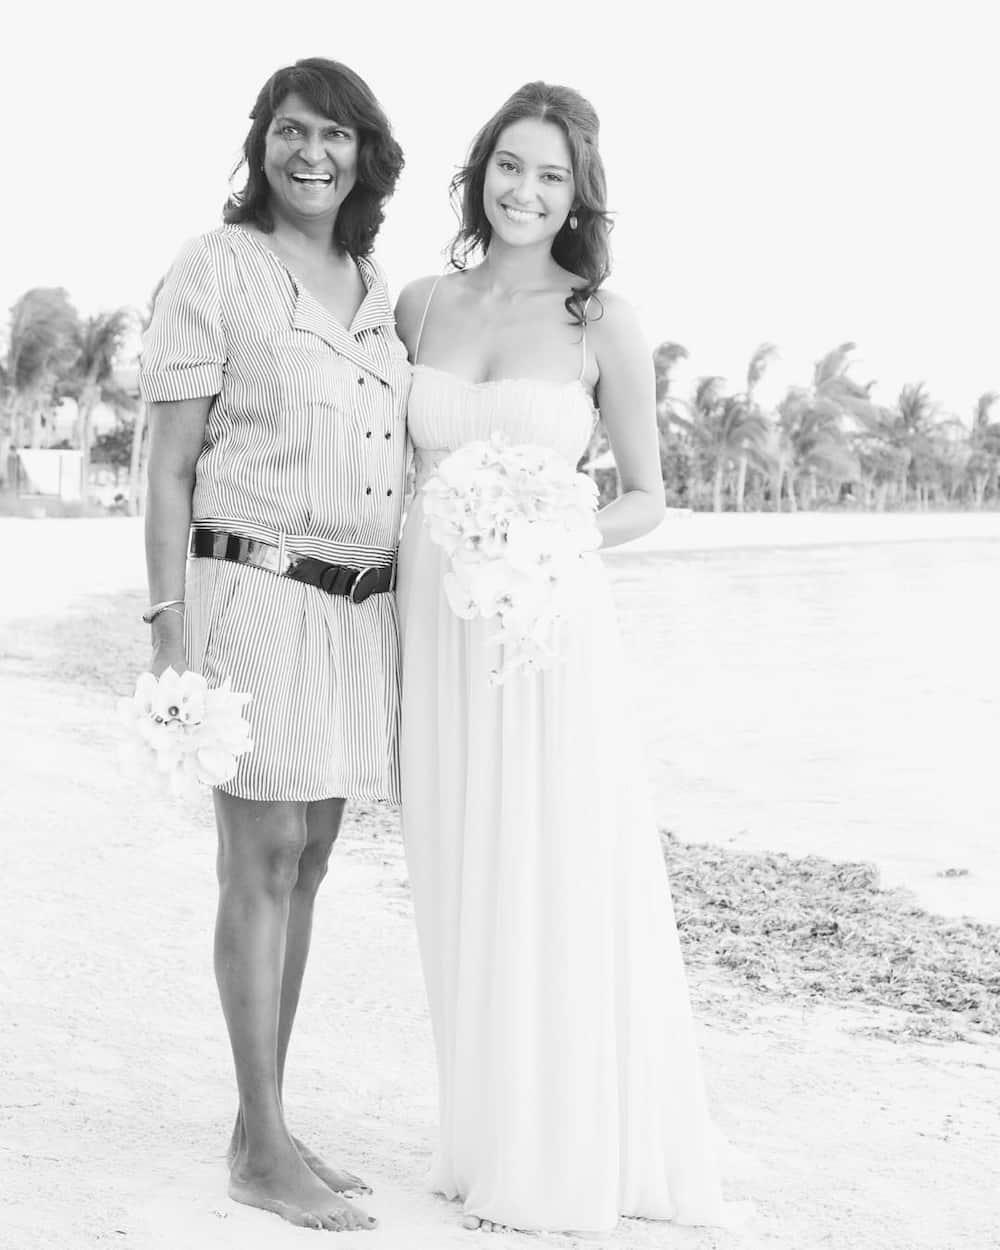 Emma Heming age, height, wedding, children and net worth